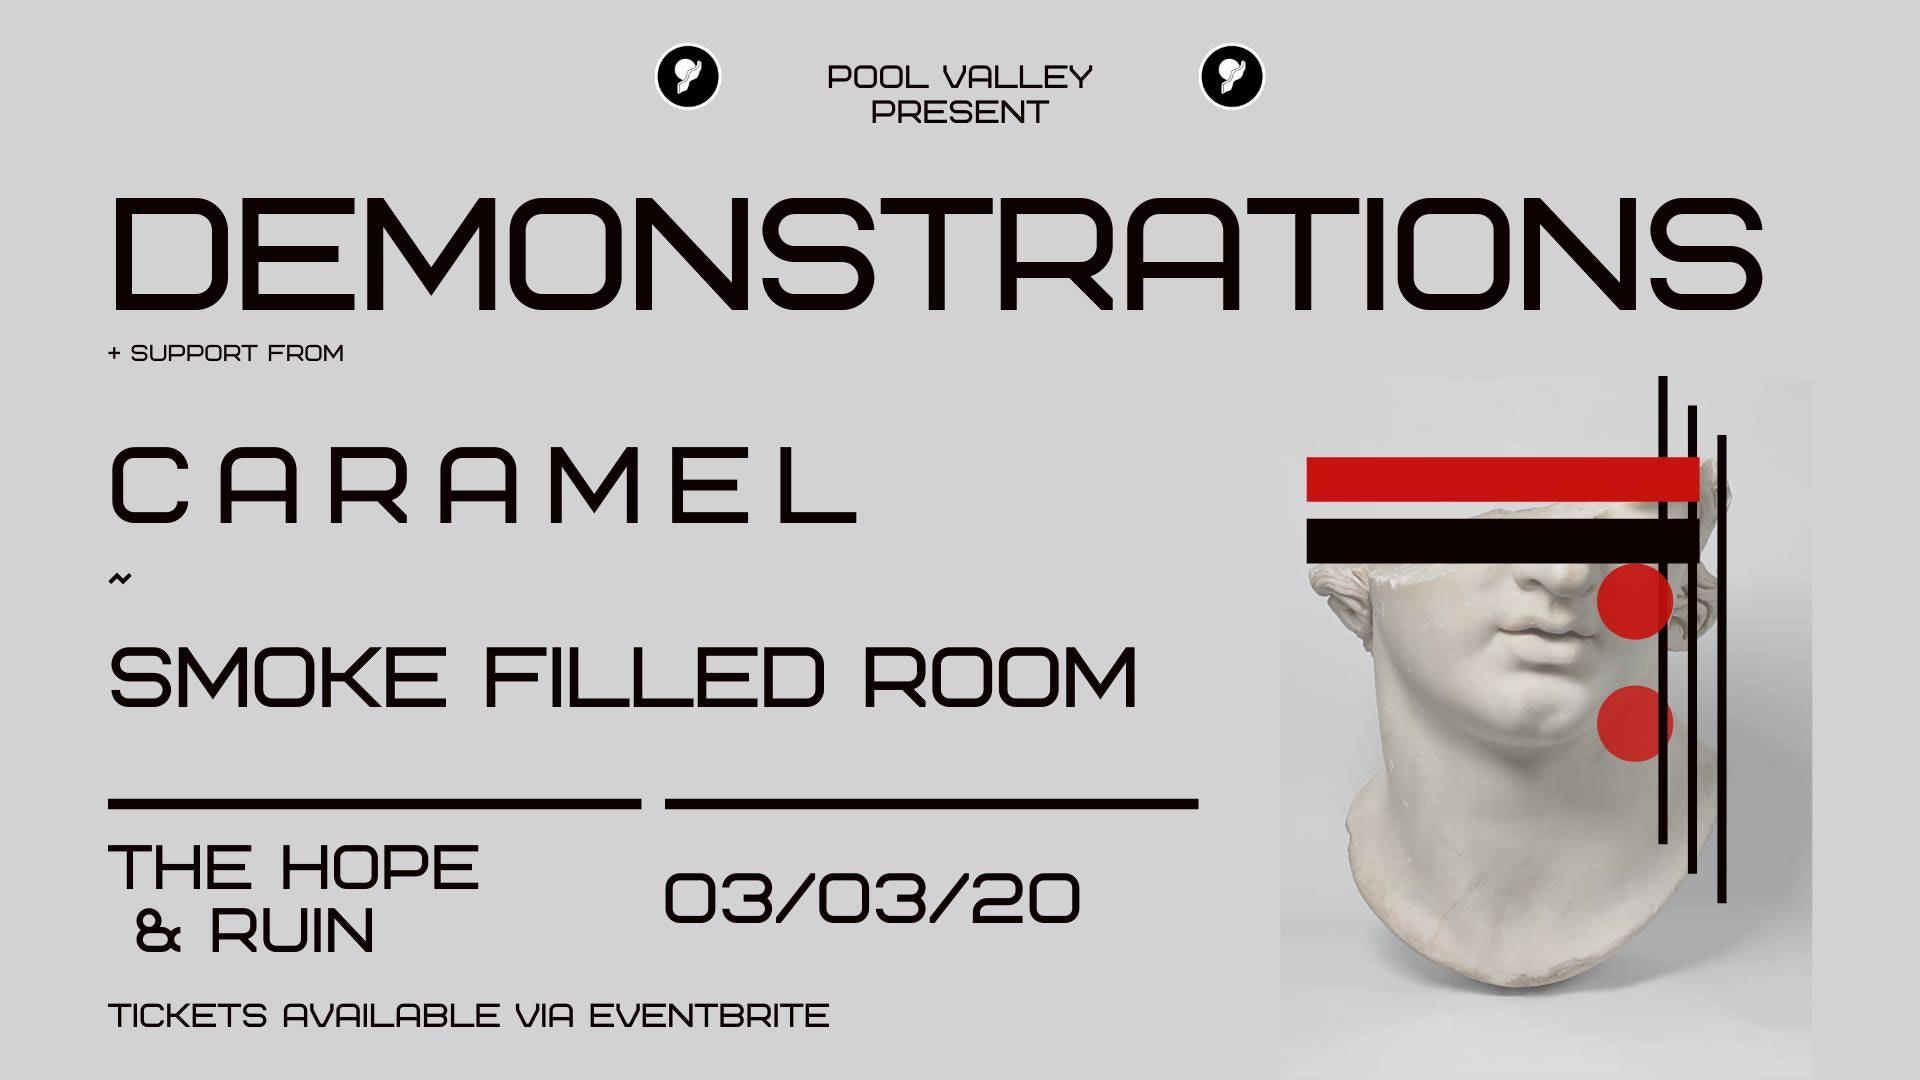 Demonstrations + Caramel + Smoke Filled Room